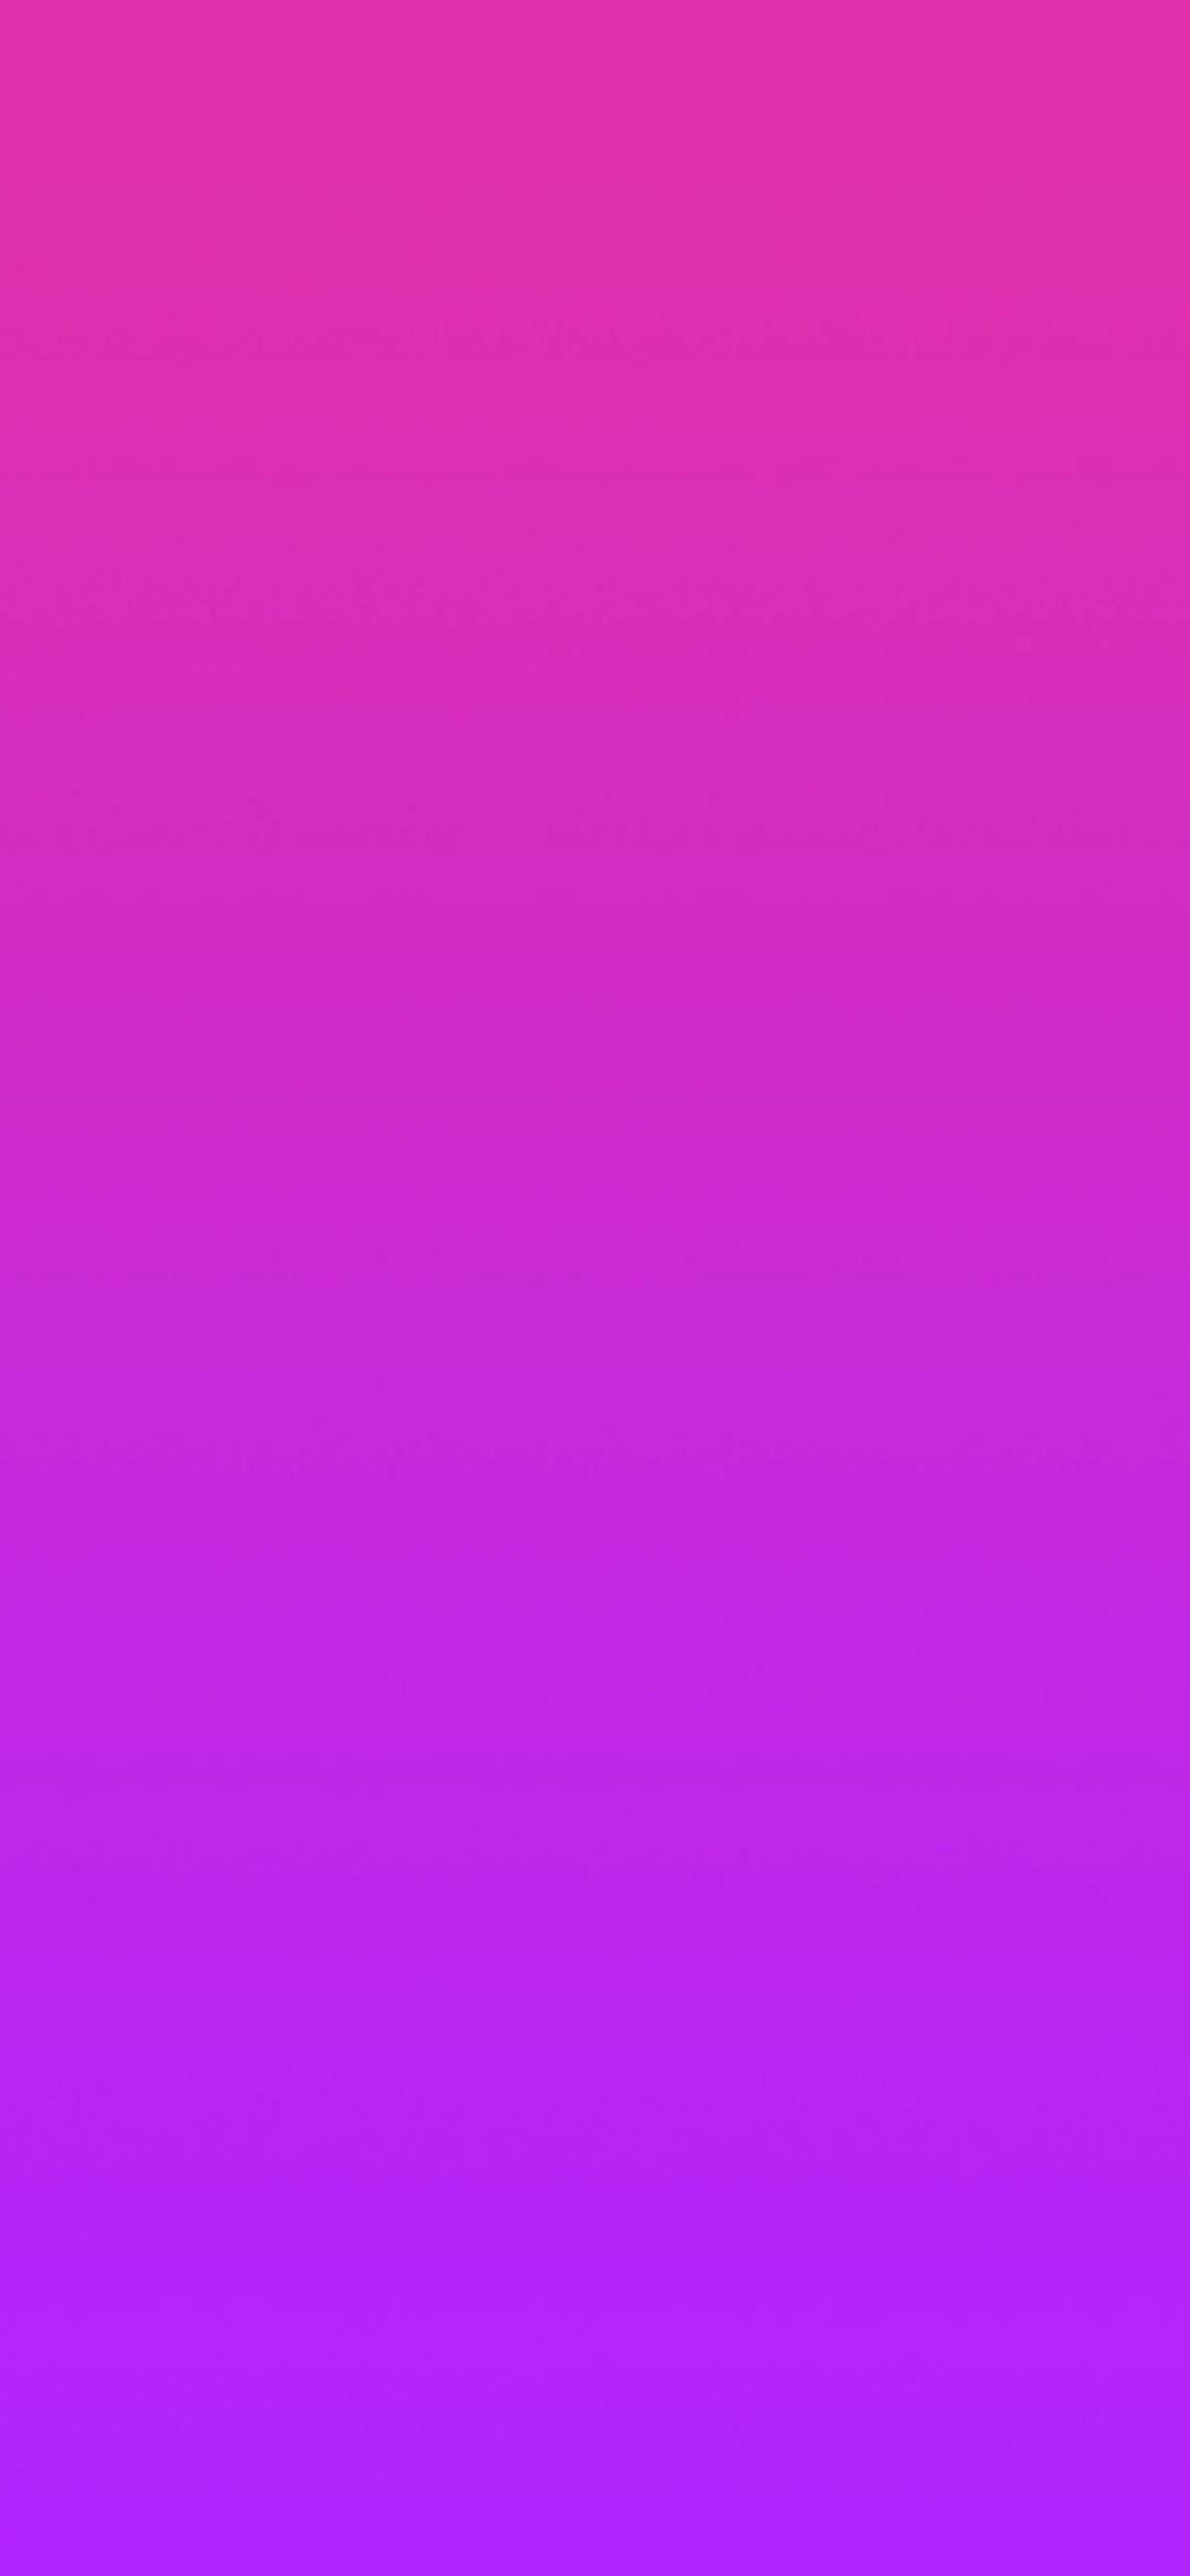 Iphone Xs Max Wallpaper 0014 Alliphonewallpapers Net